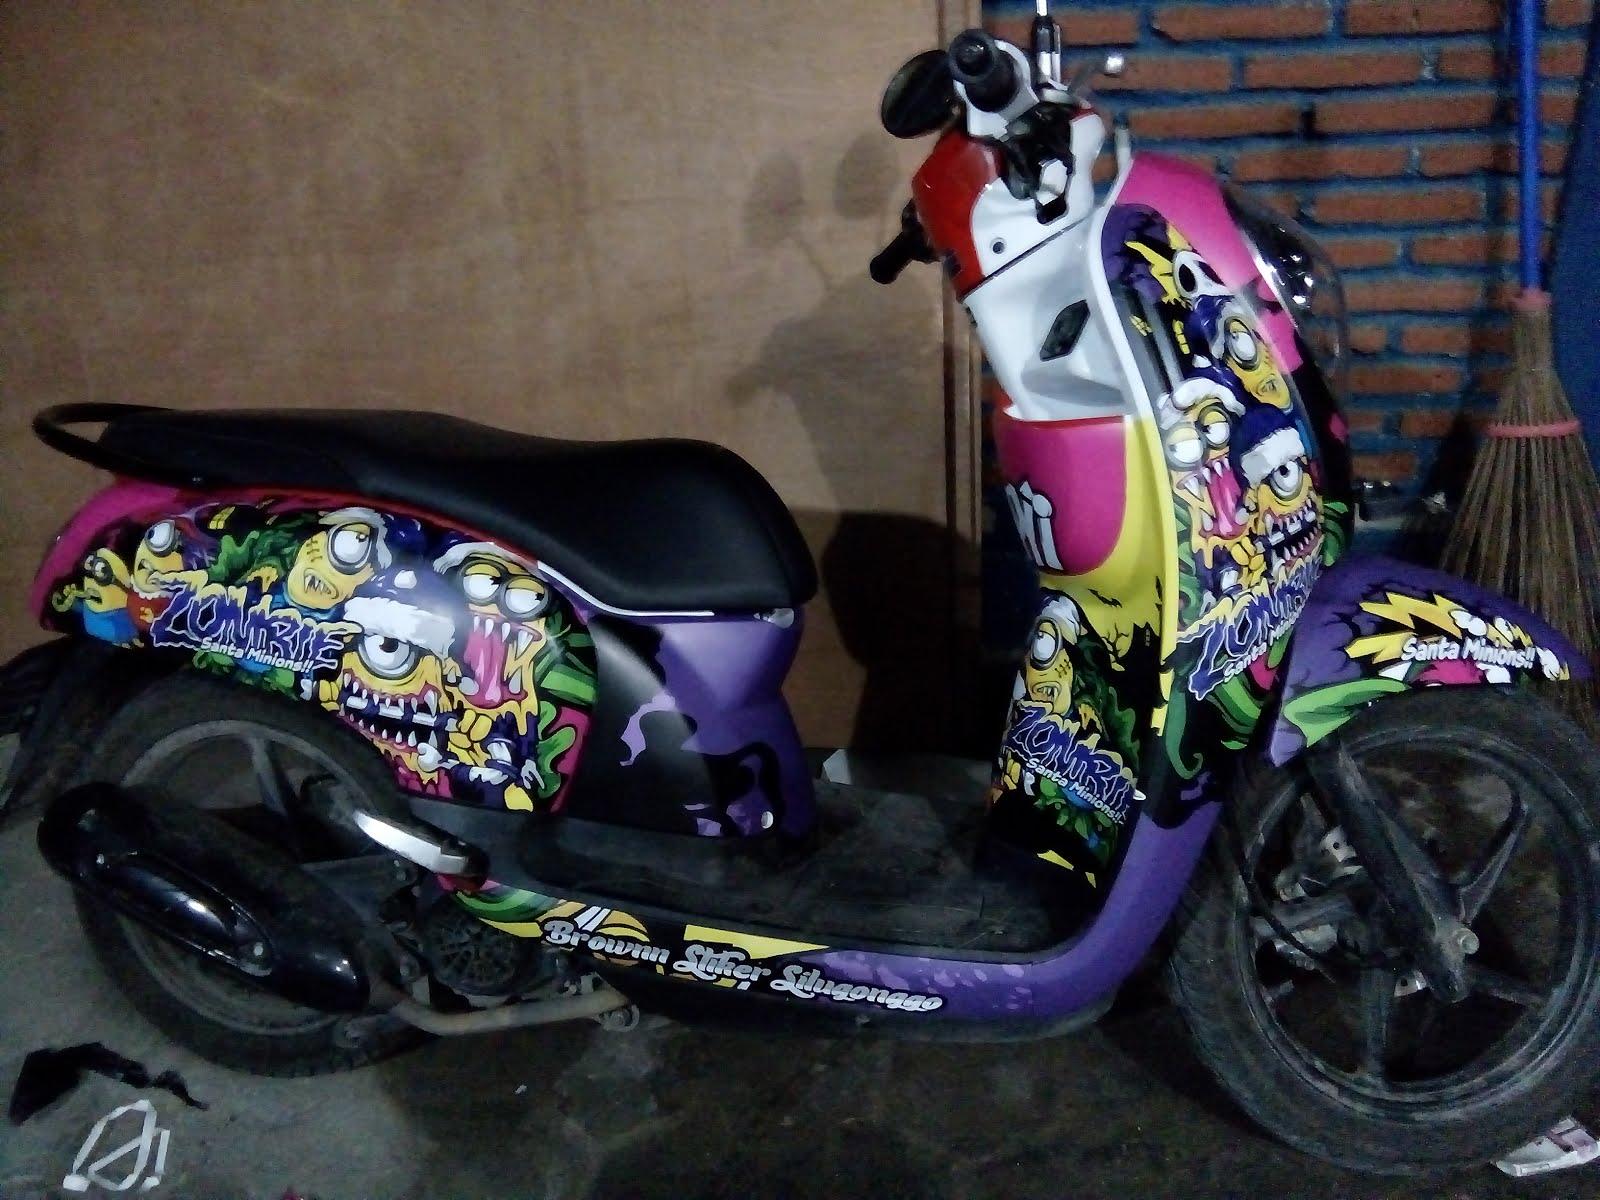 Brownn Silugonggo C2 Sticker Syndicate Decal Scoopy Jurix Minion Zombie